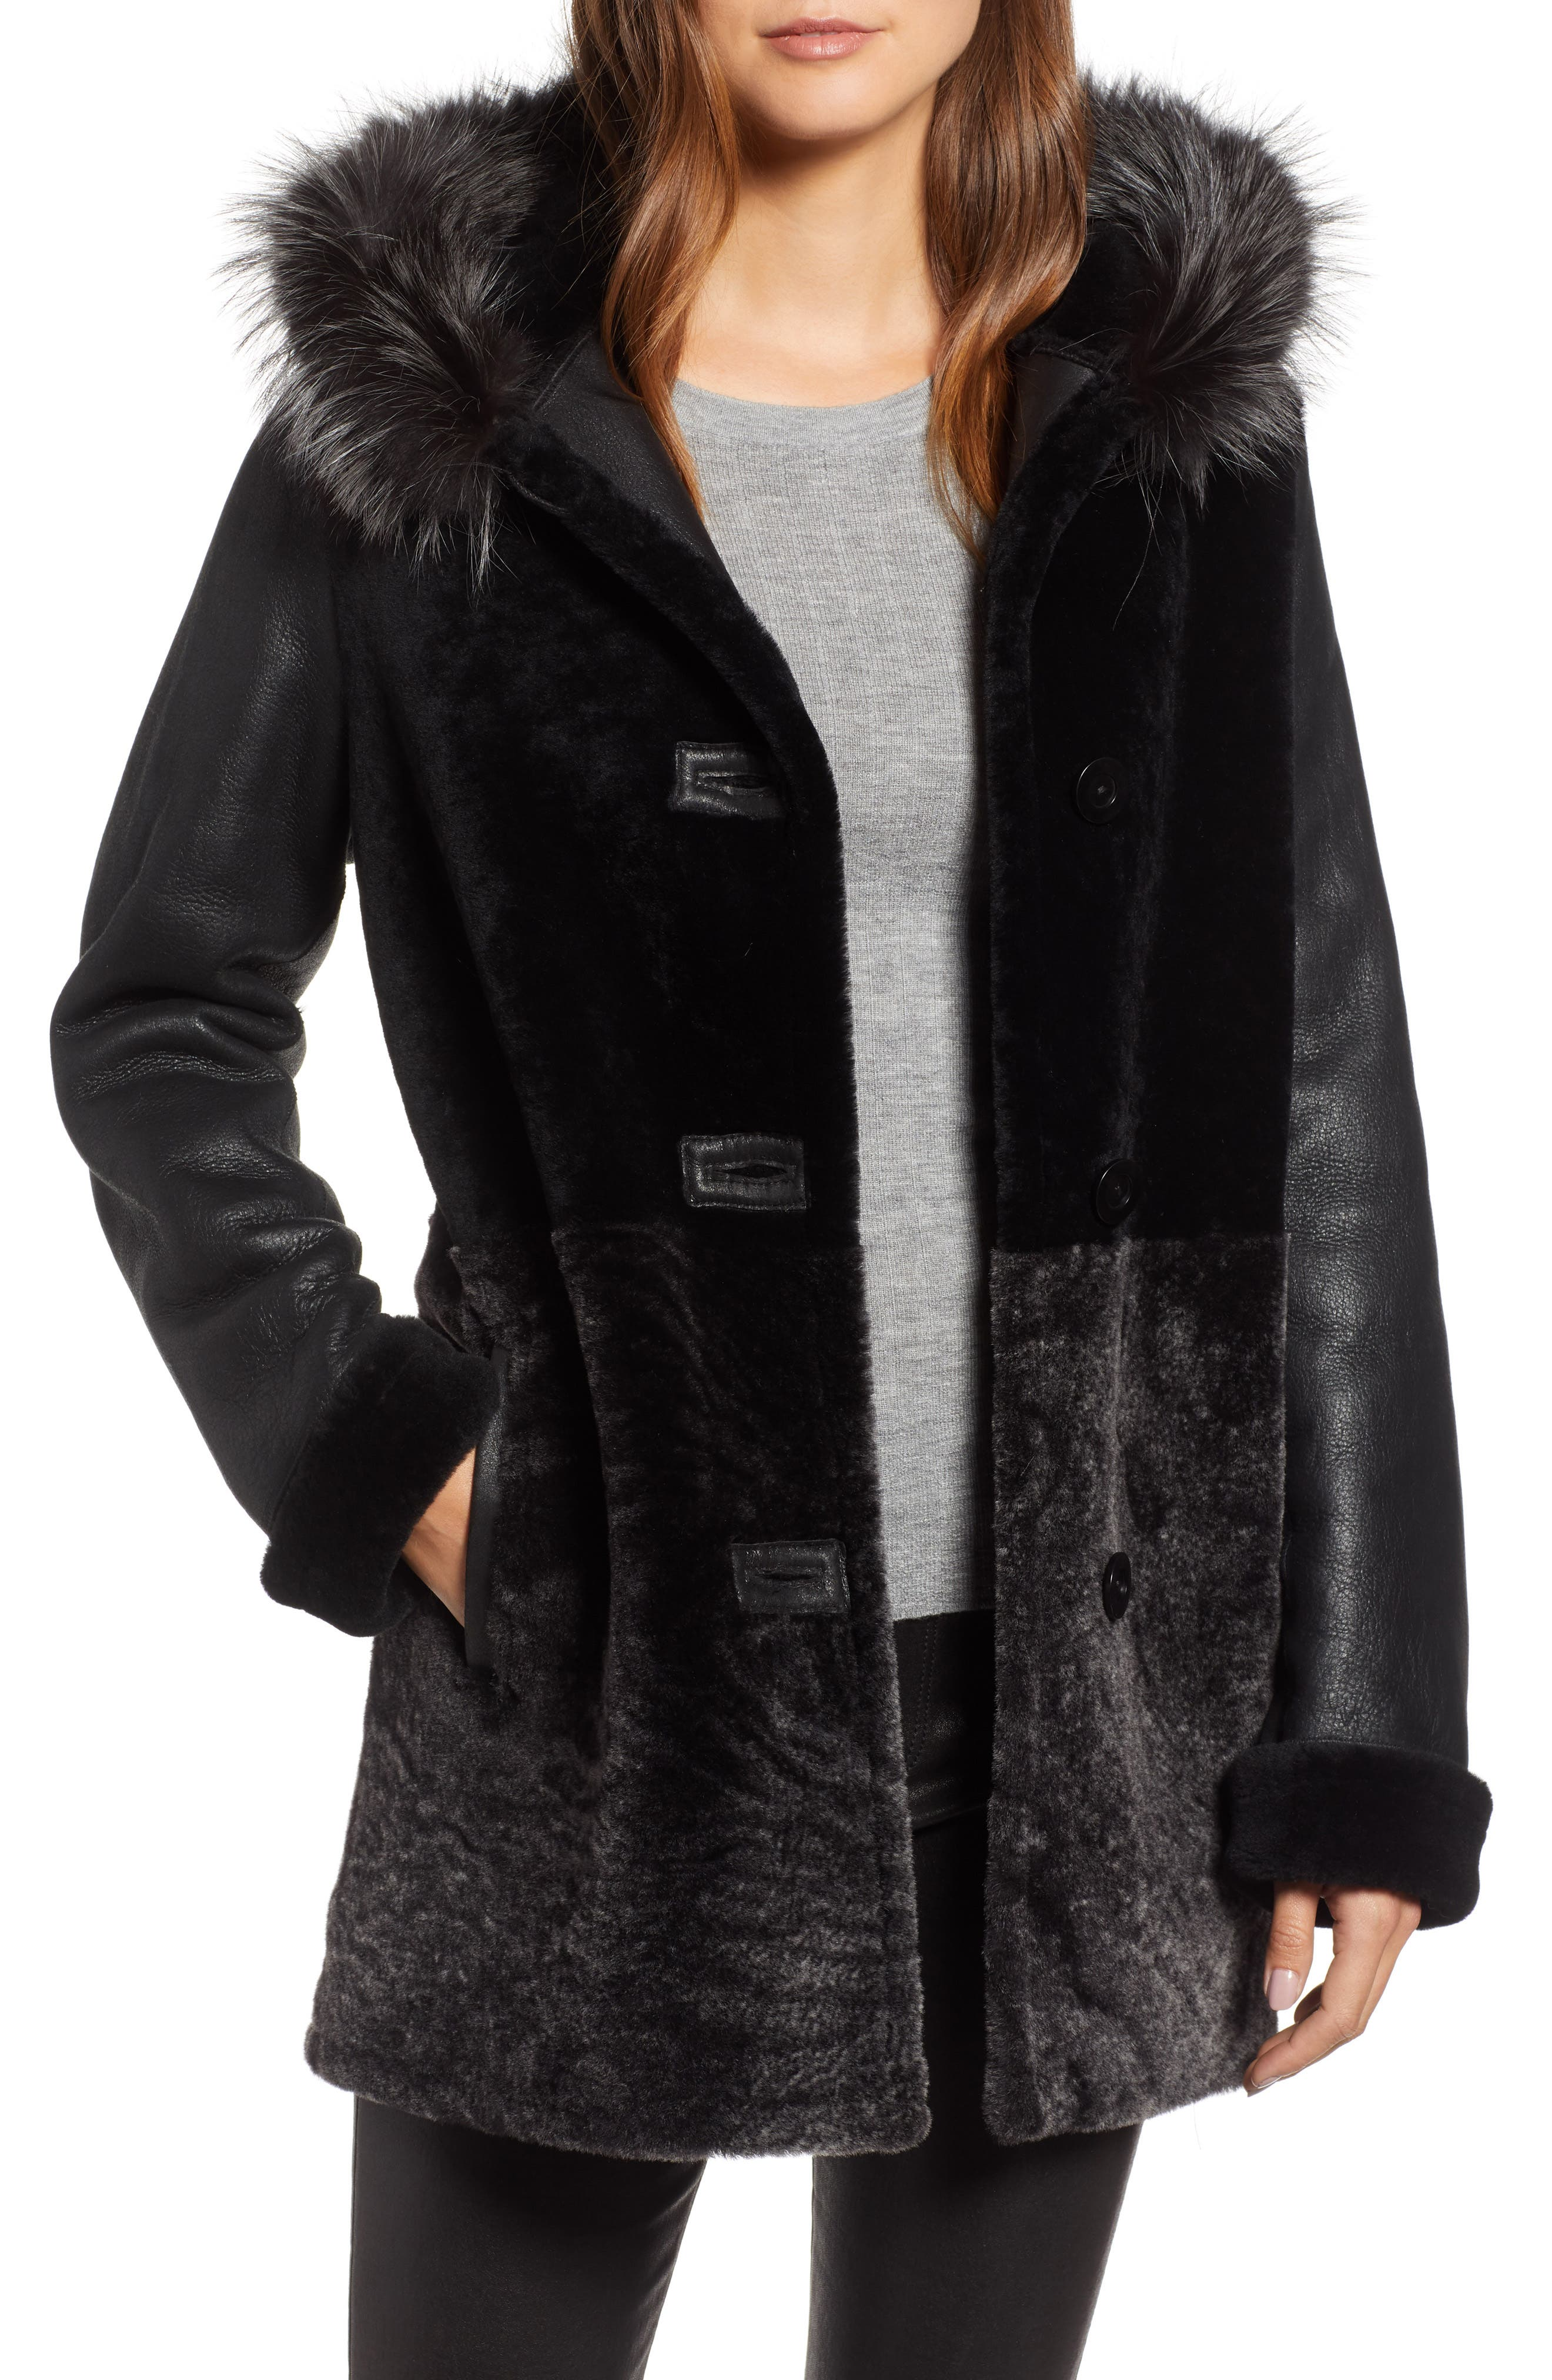 Blue Duck Genuine Shearling Coat With Genuine Fox Fur Trim, Black